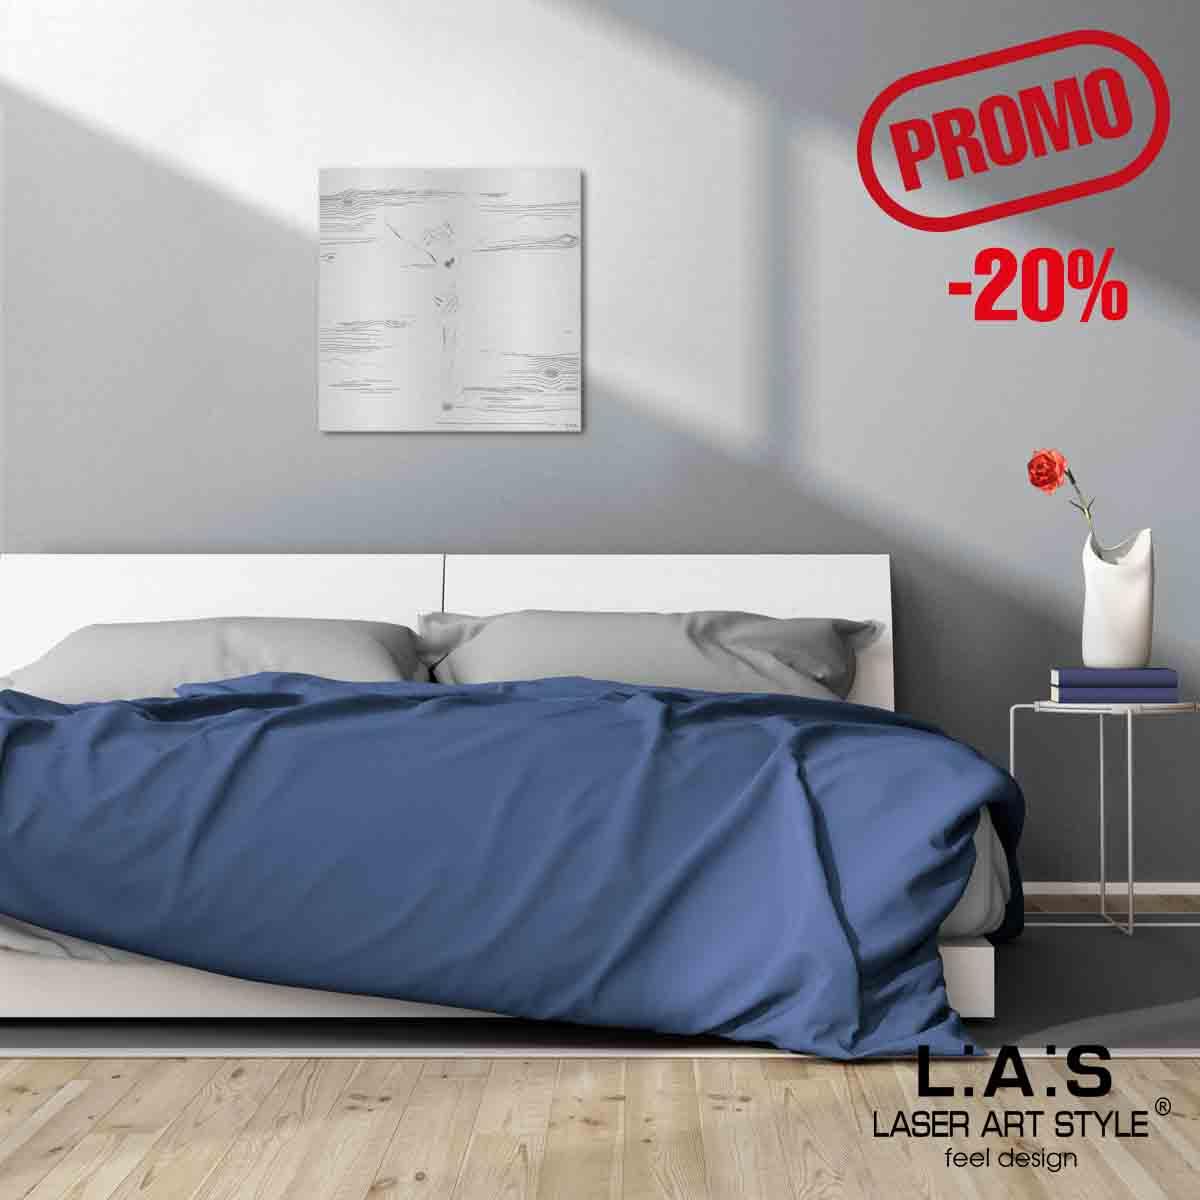 L:A:S - Laser Art Style - CROCIFISSO DA PARETE MODERNO Q-036-T8 ARGENTO